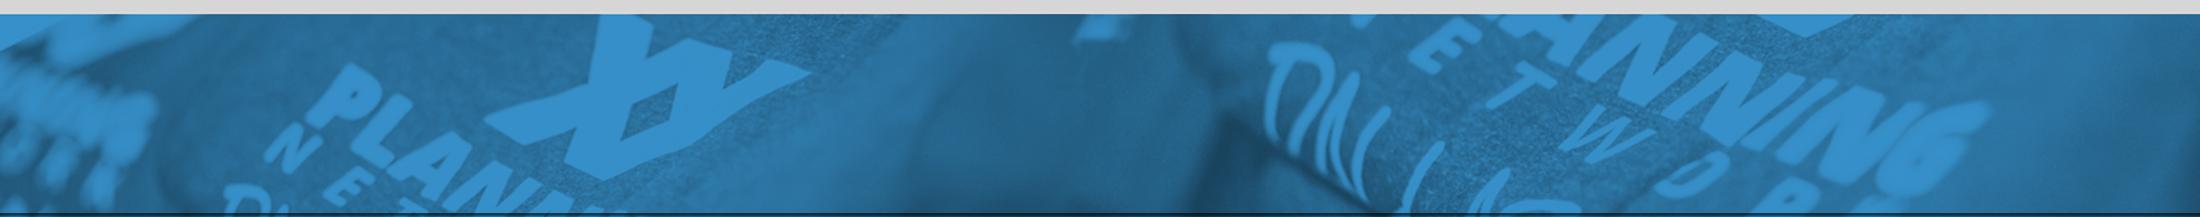 XYPN BANNER SIZE 7.jpg